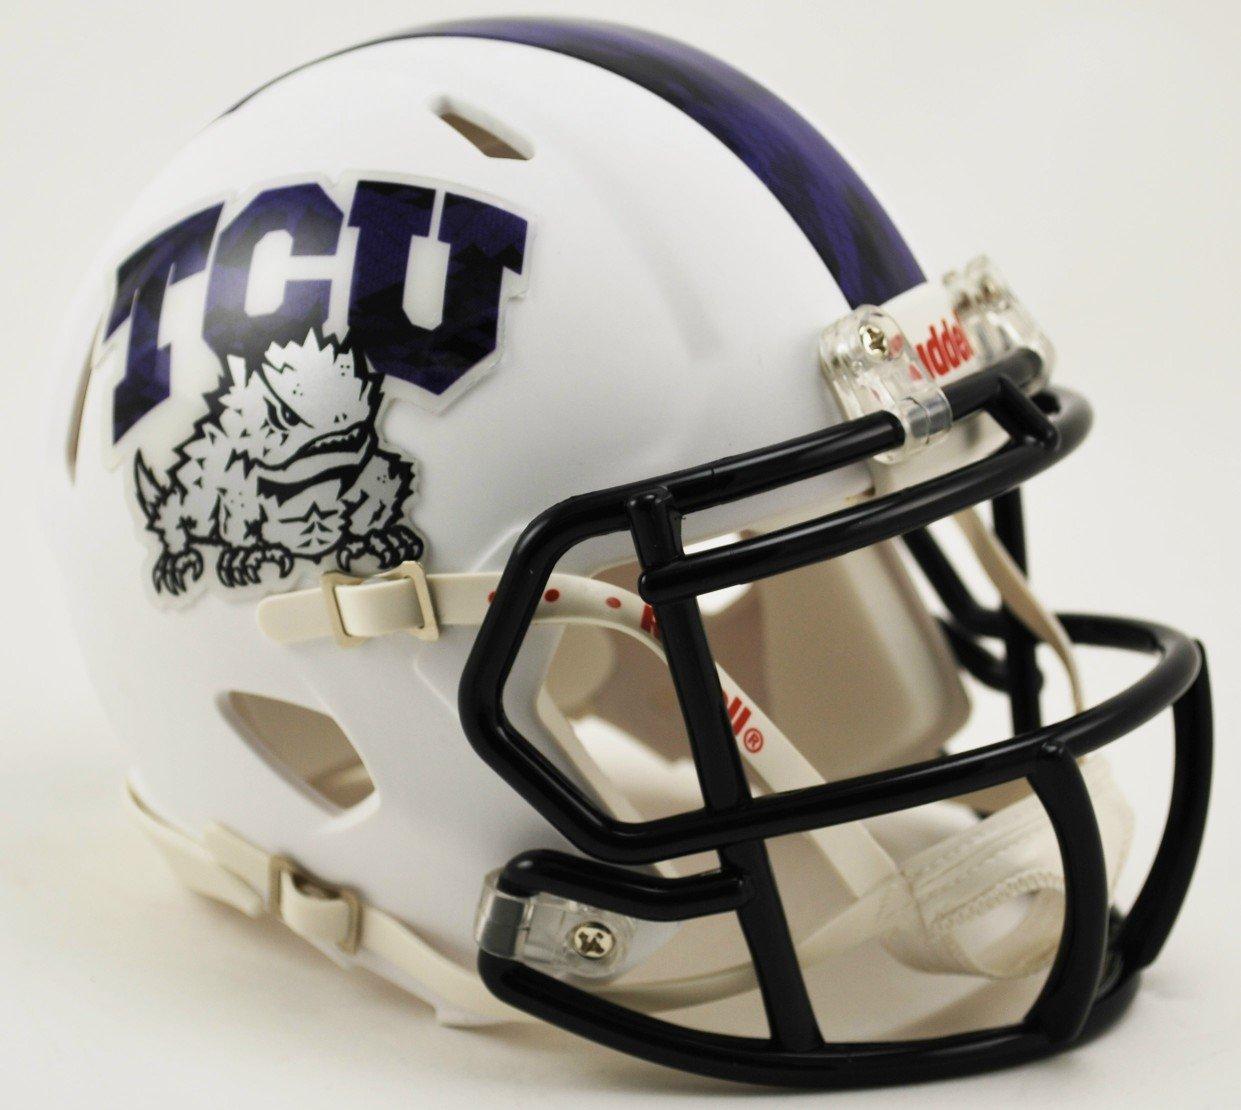 TCU Texas Christian University Riddell Speed Mini Football Helmet 2015 Frog Skin New in Riddell Box